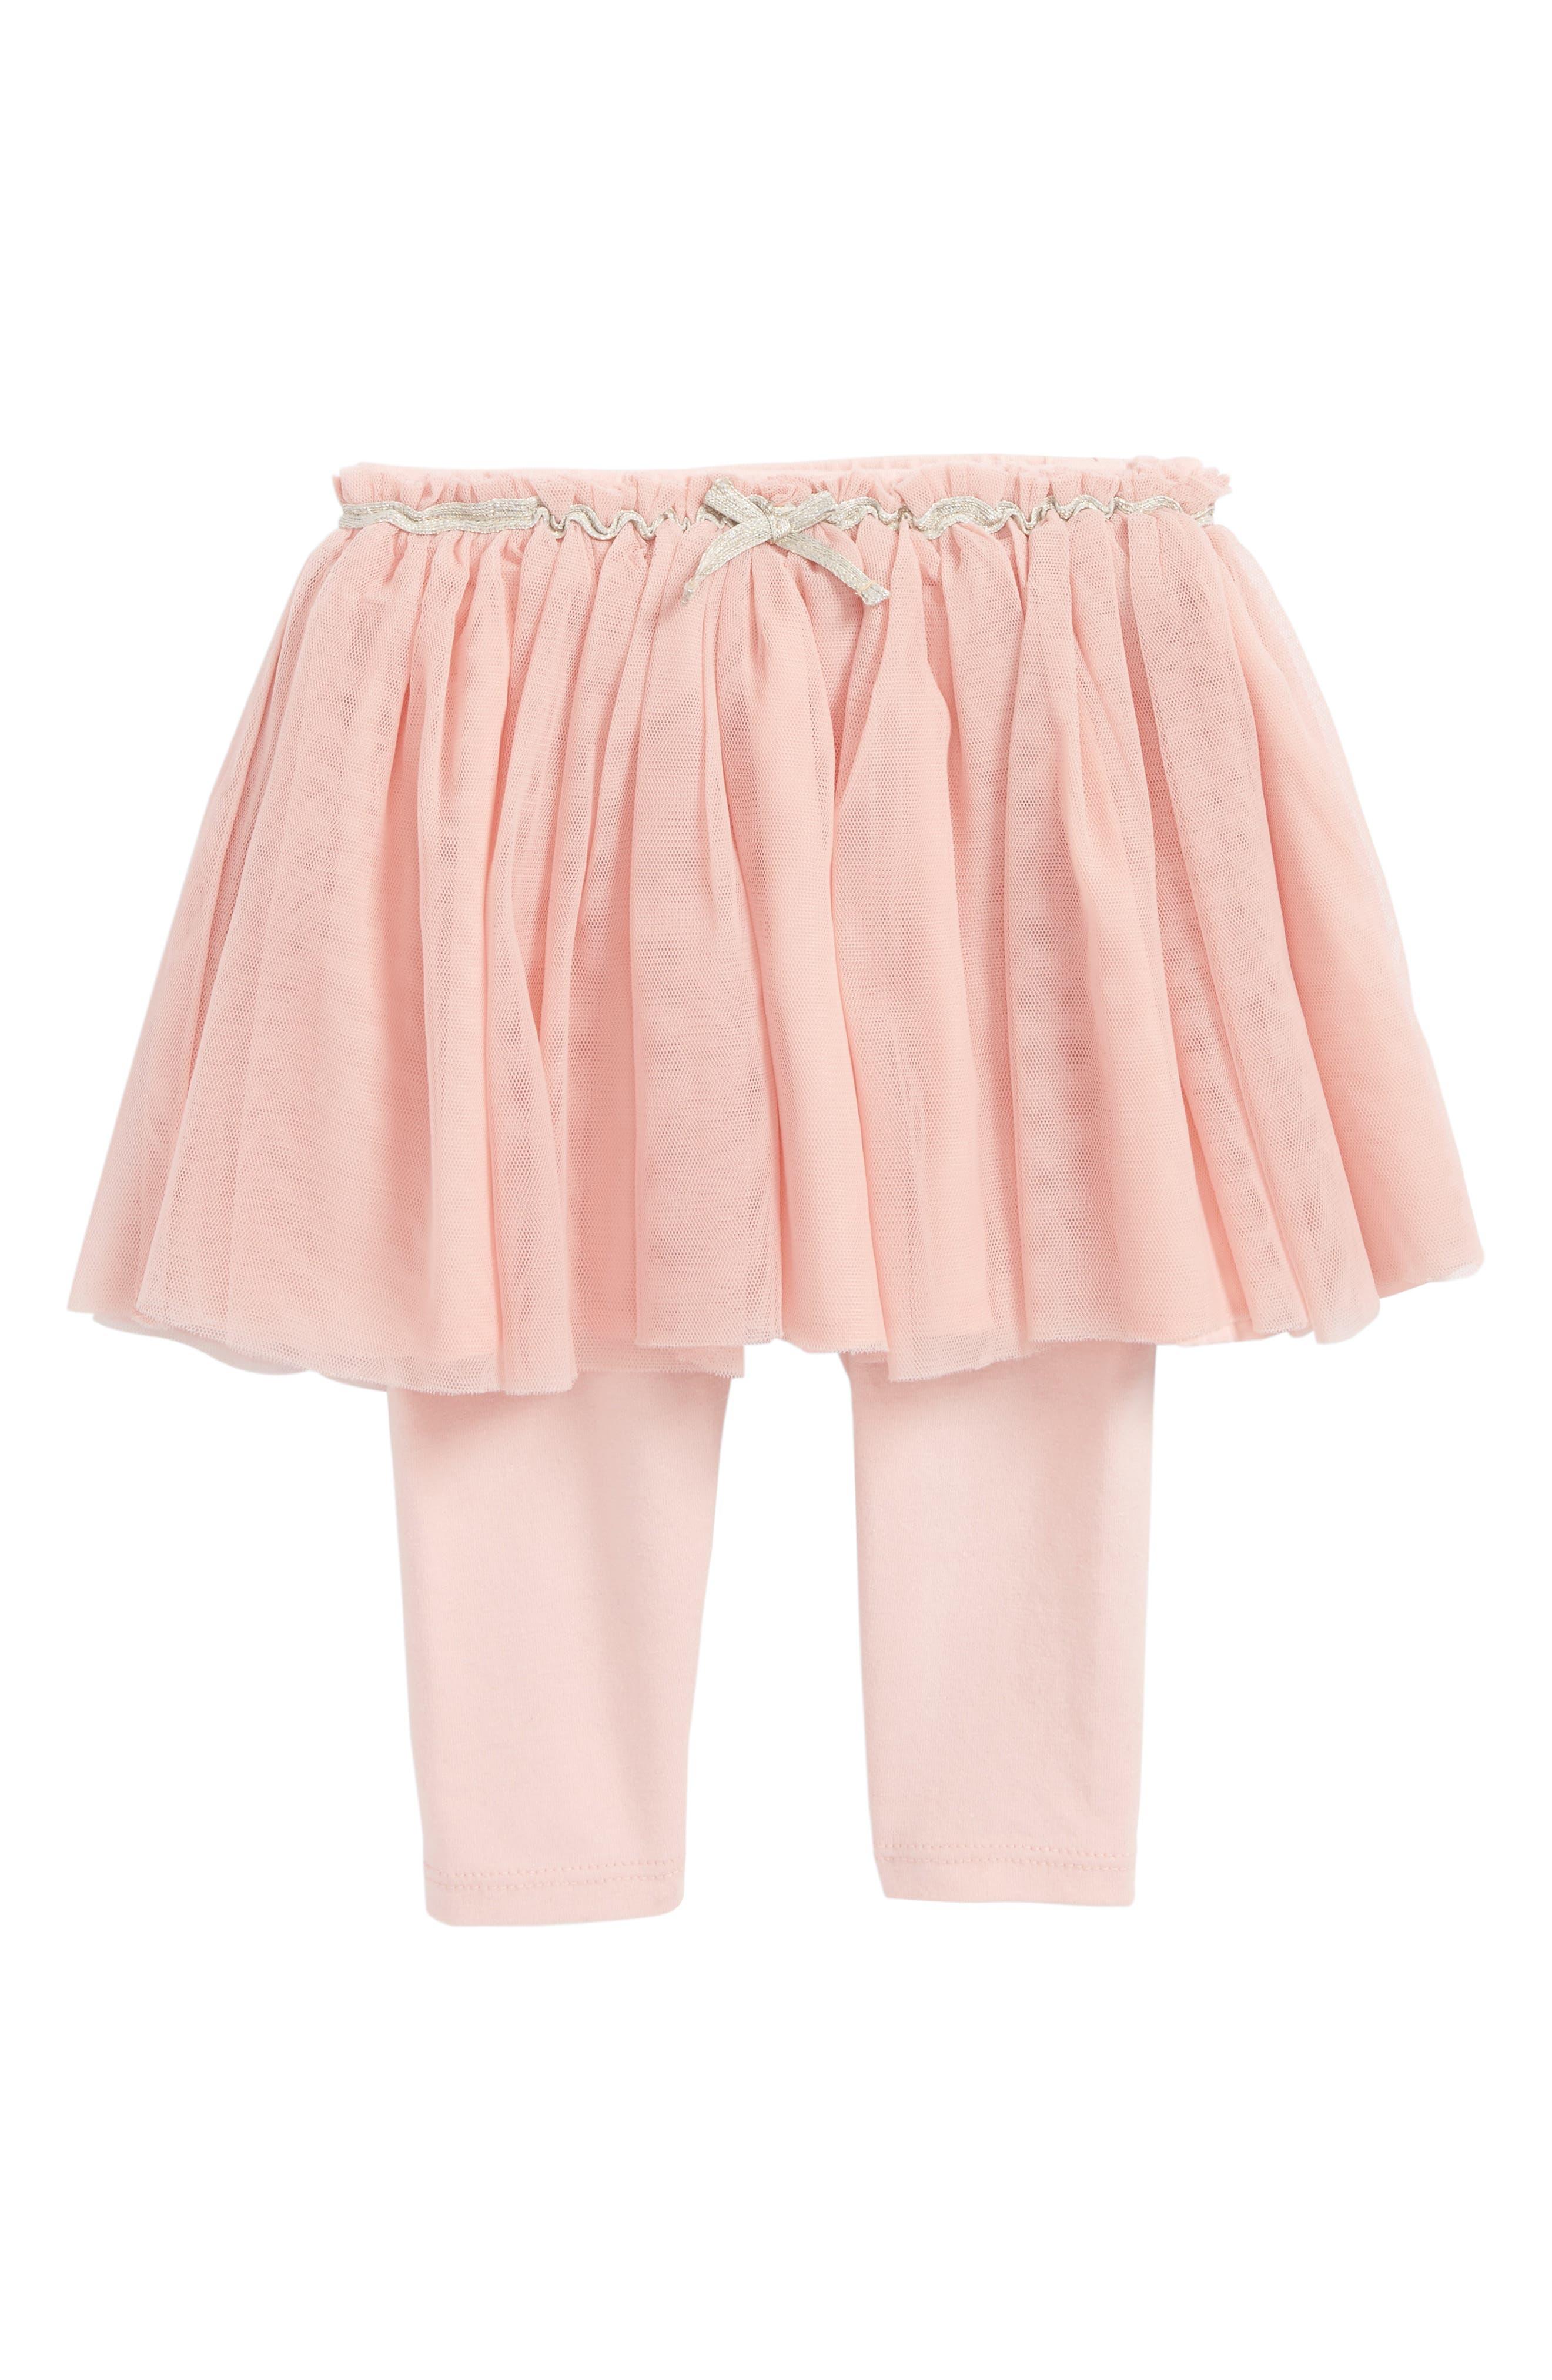 Tutu Leggings,                             Main thumbnail 1, color,                             Pink Silver